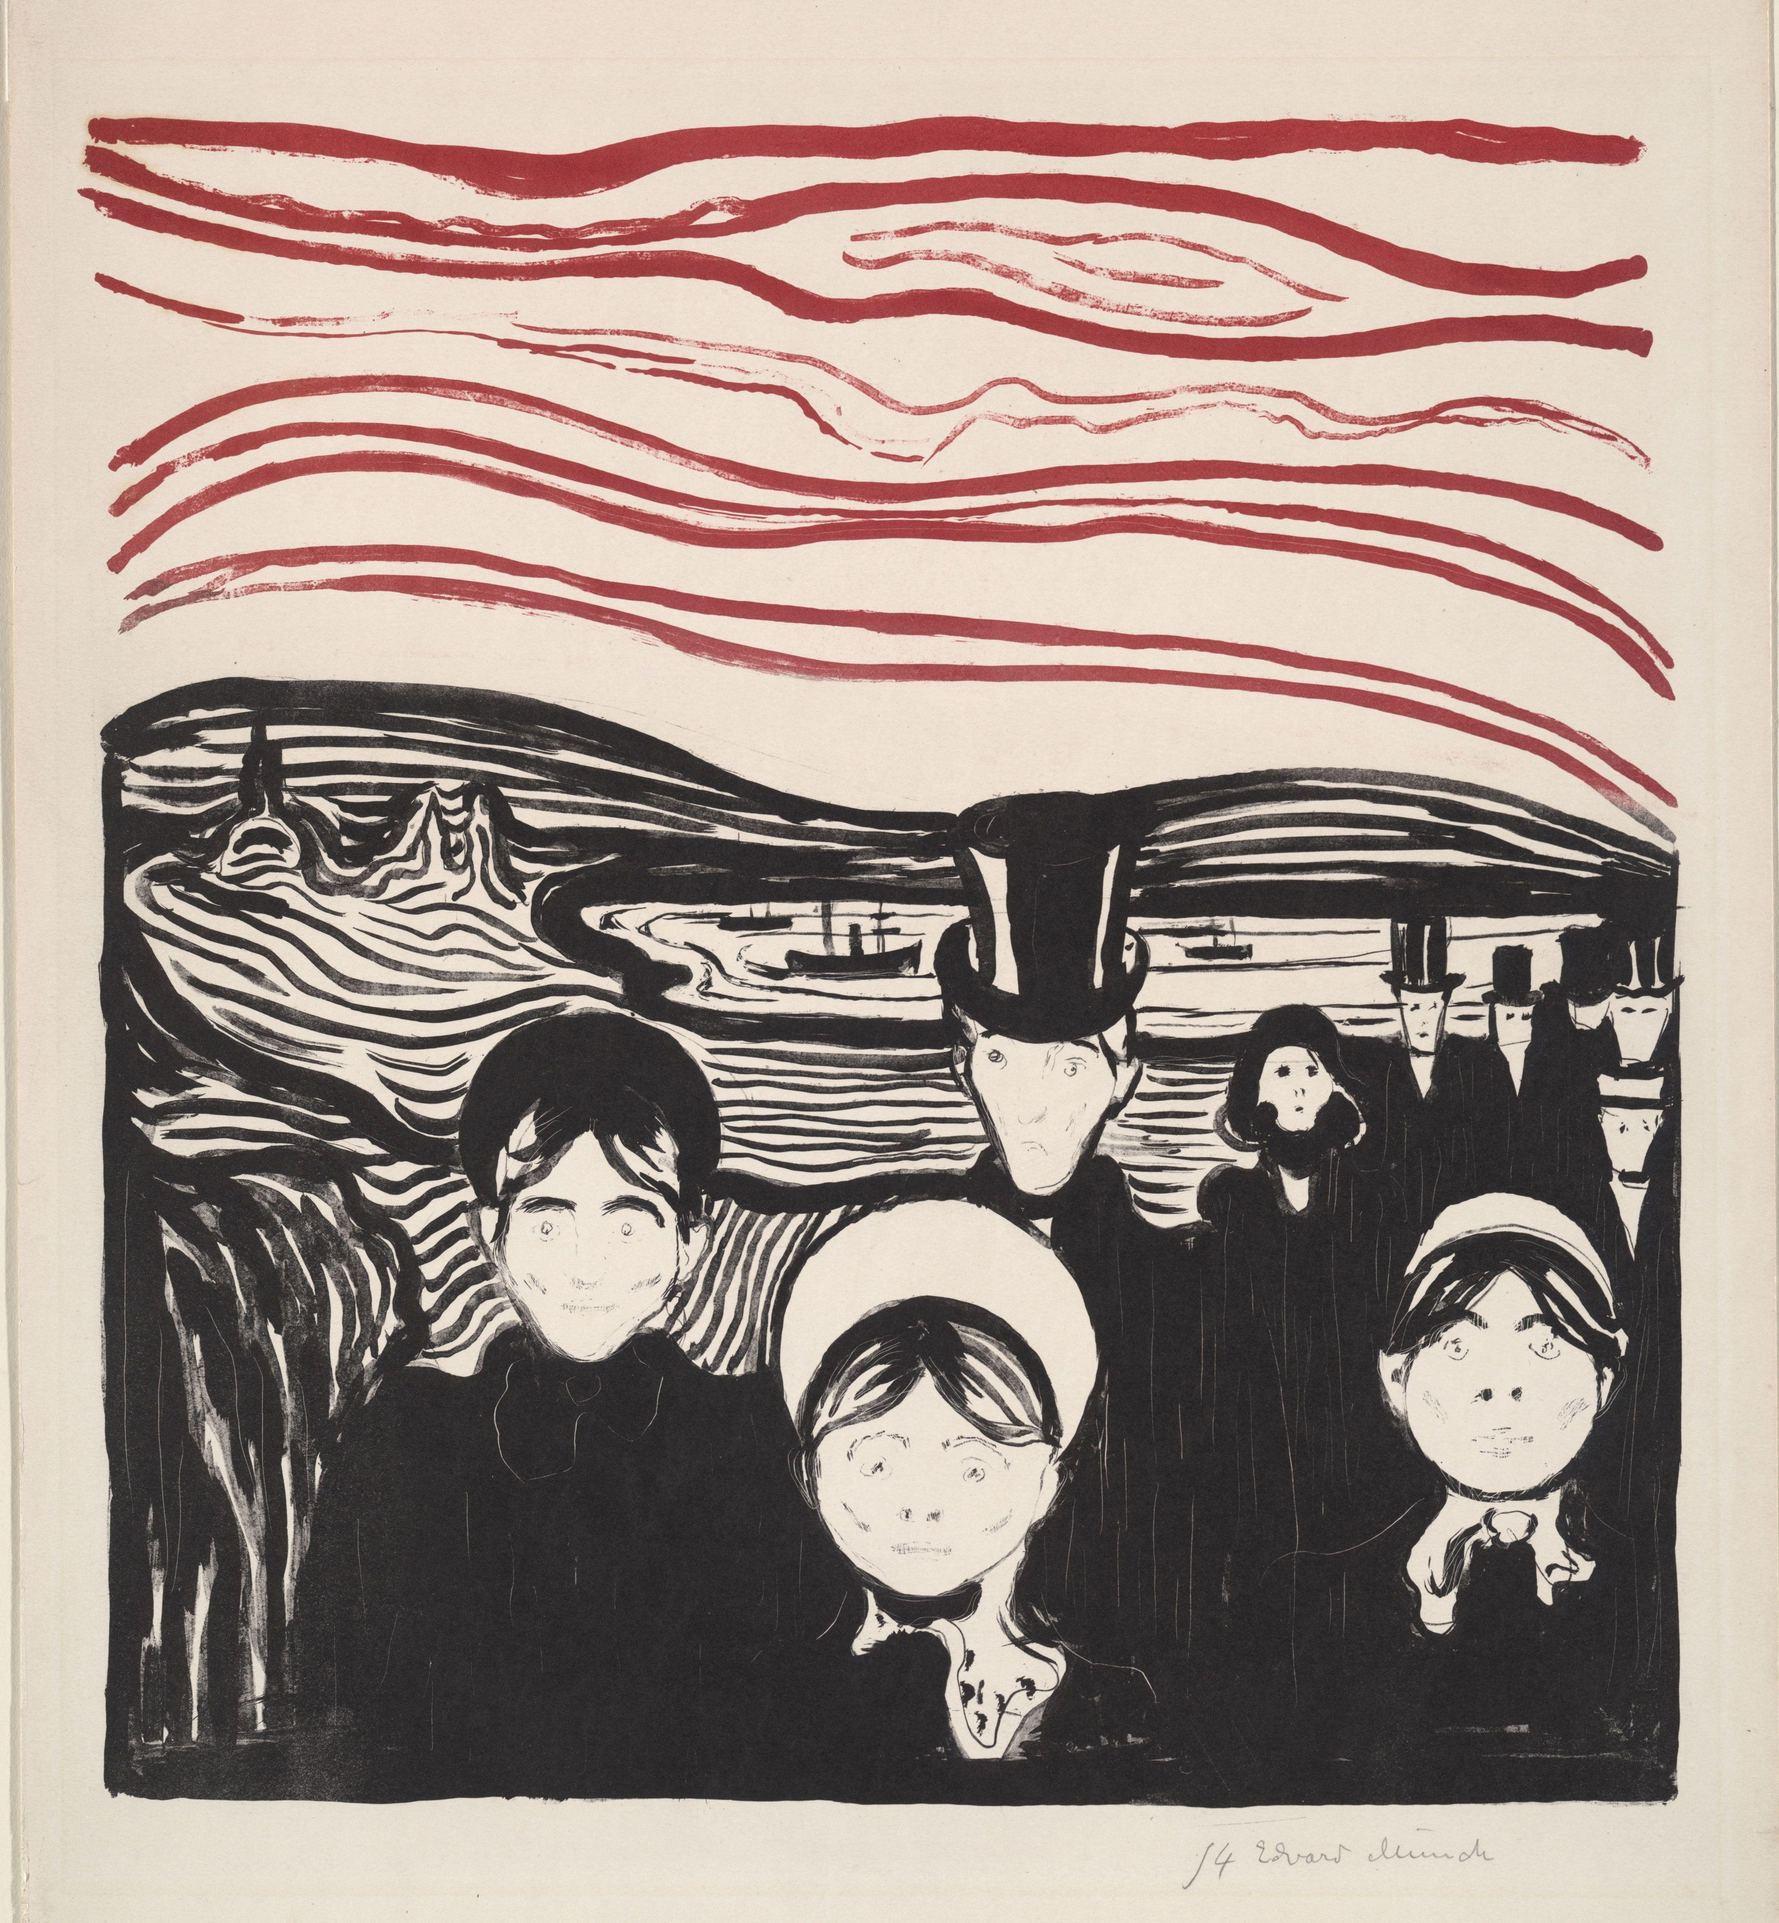 Edvard Munch - Angst, 1896